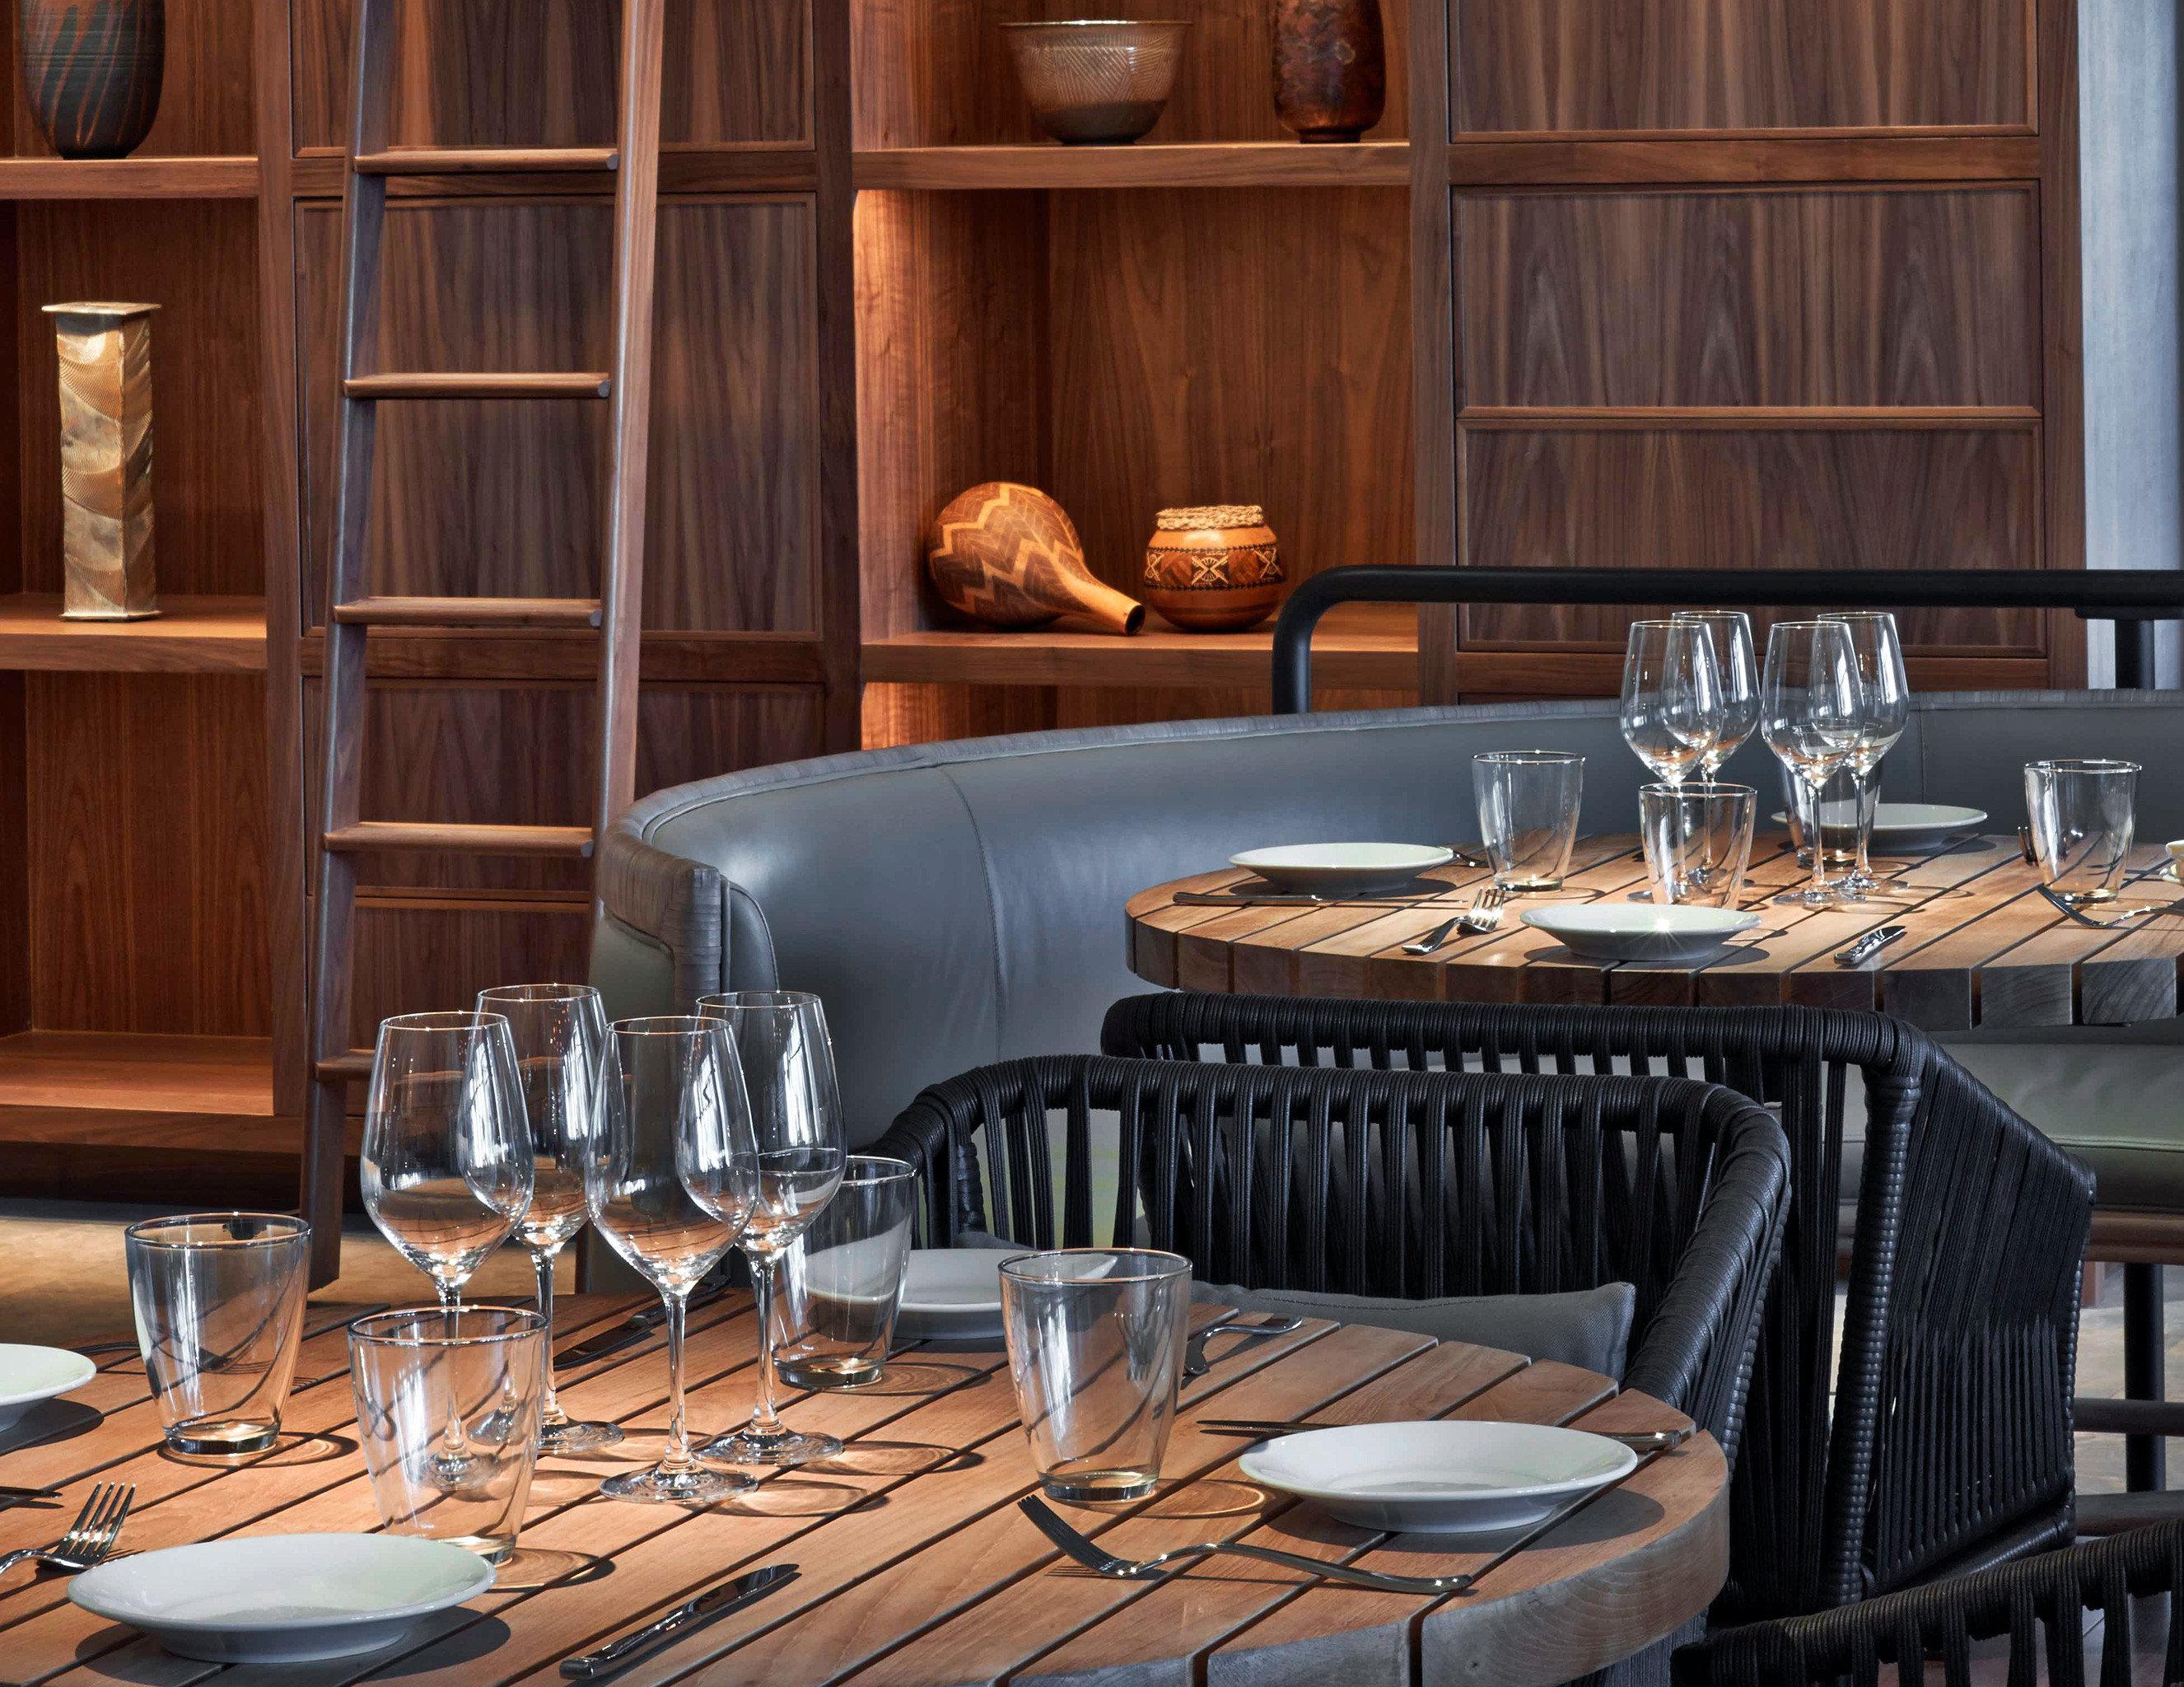 Dining Drink Eat Honeymoon Luxury Romance Romantic wooden restaurant home living room Bar